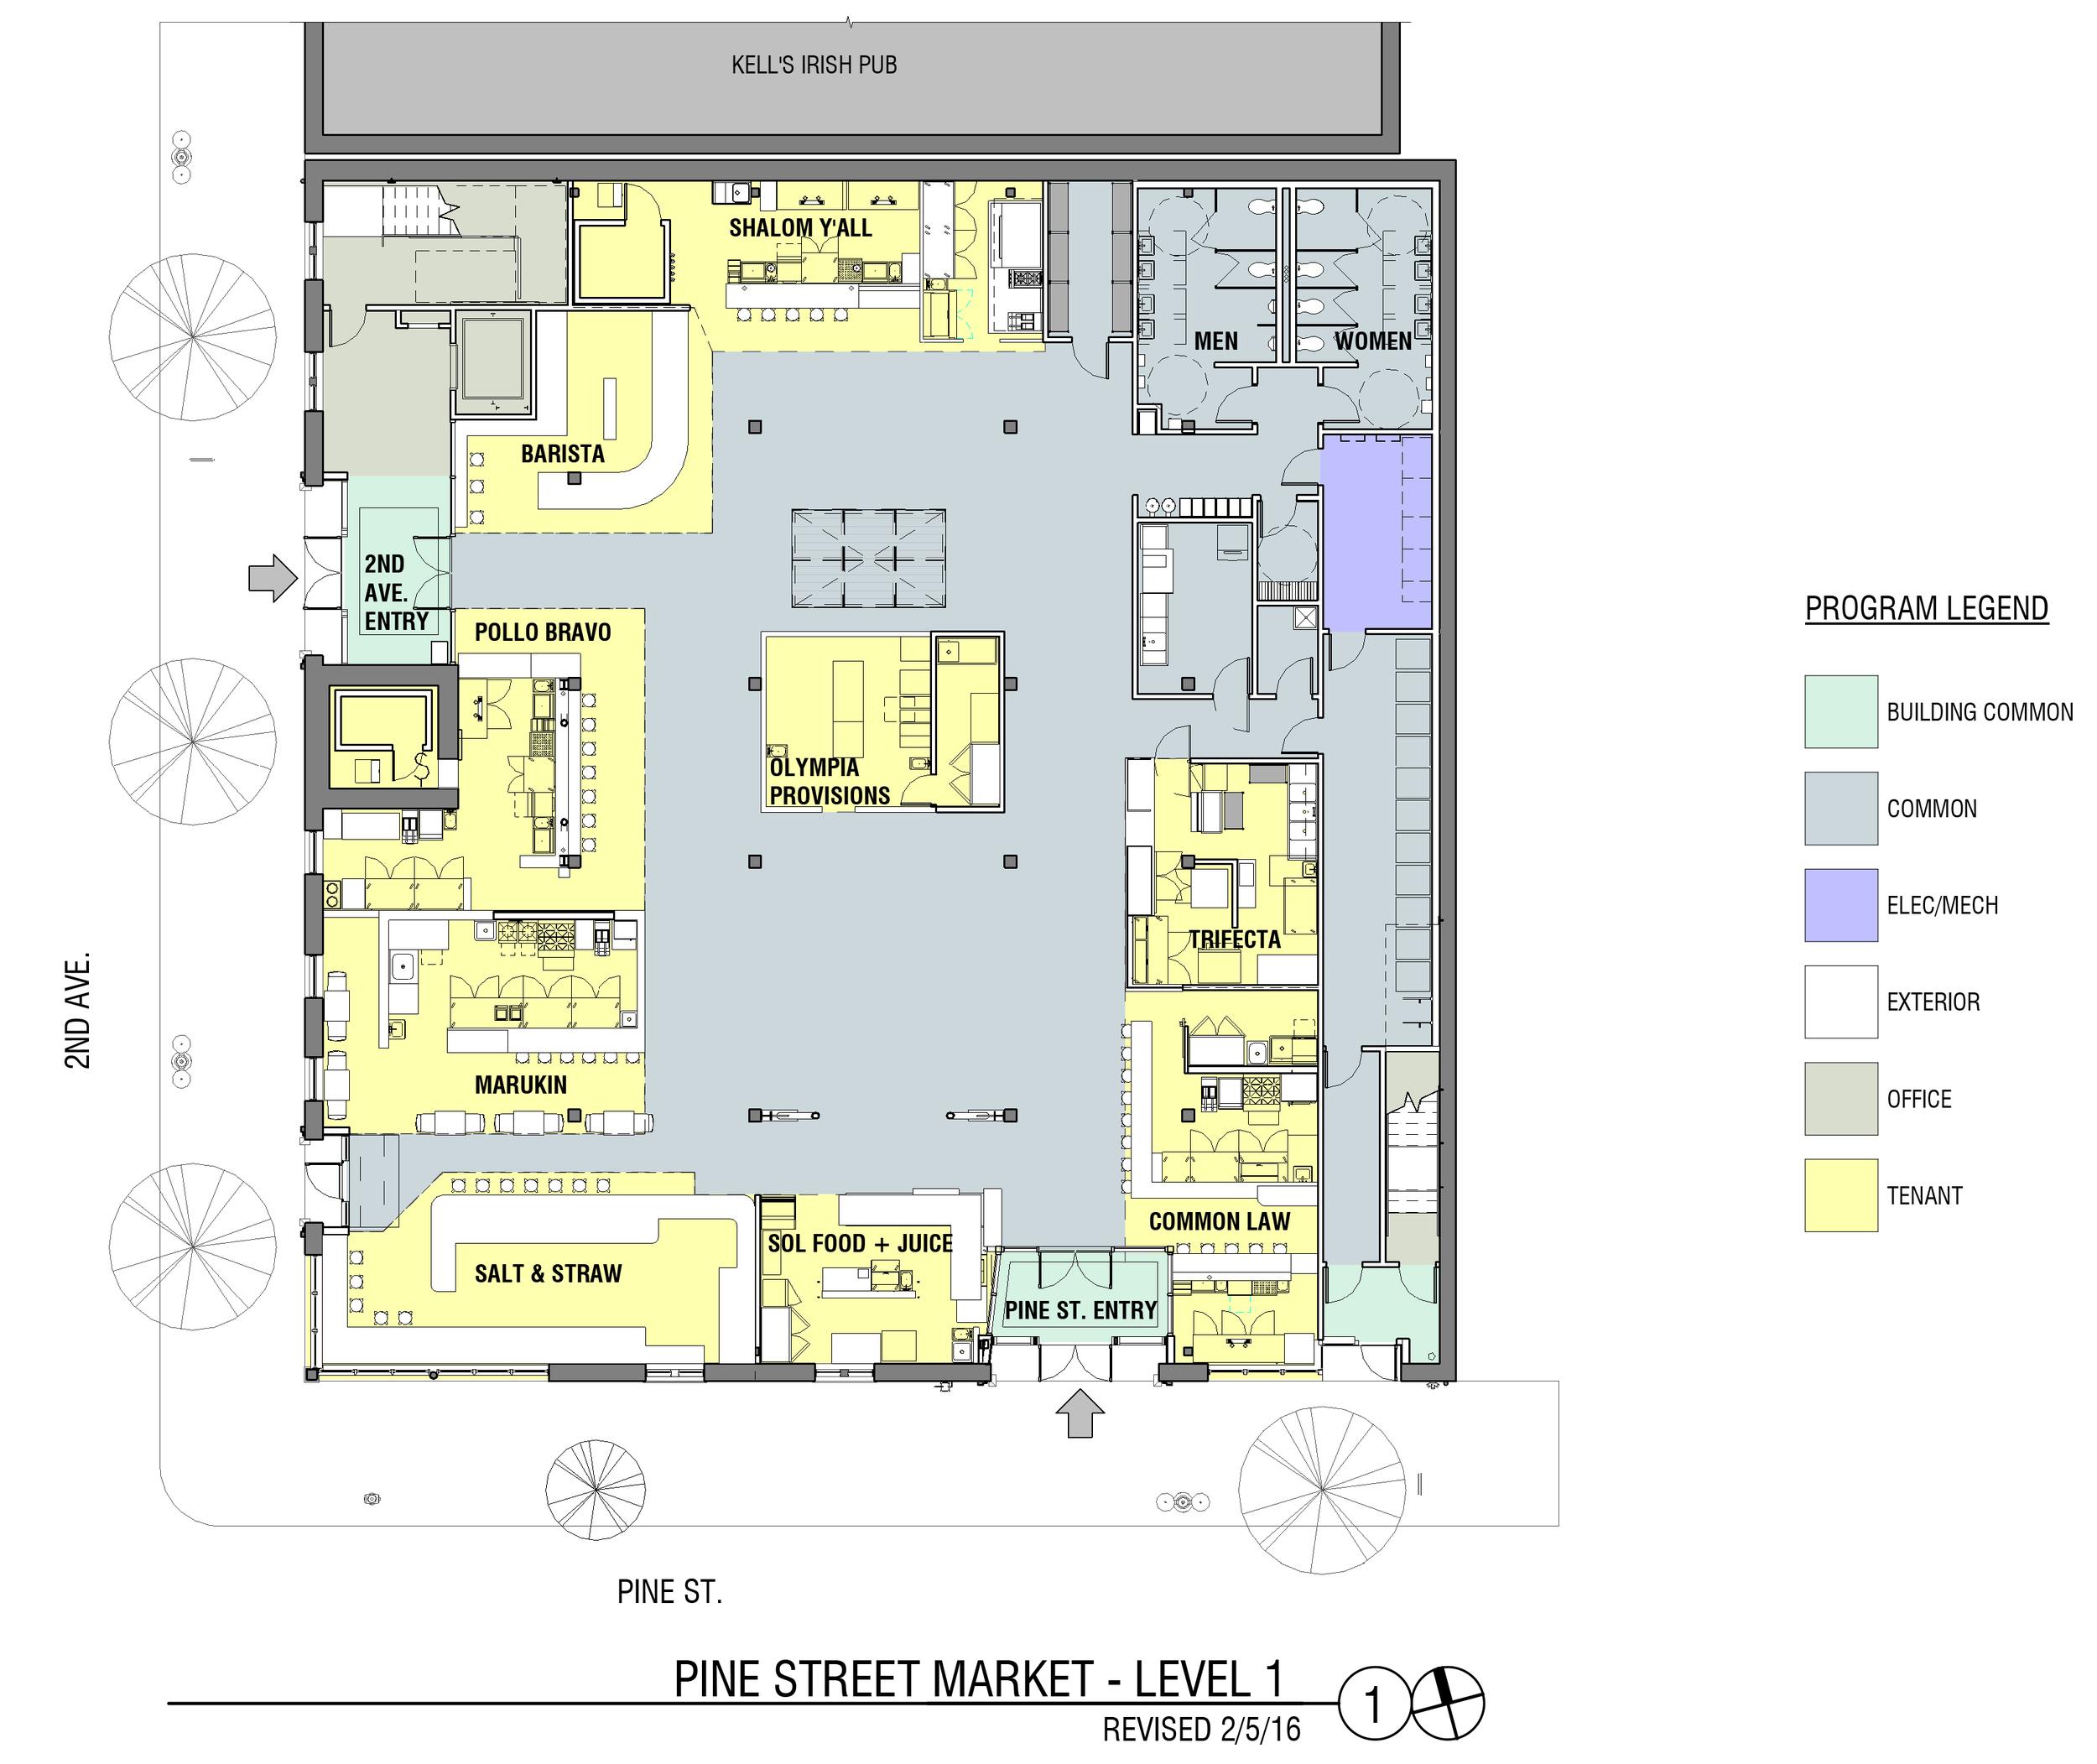 Pine Street Market - CONCEPT PLAN 012616.png